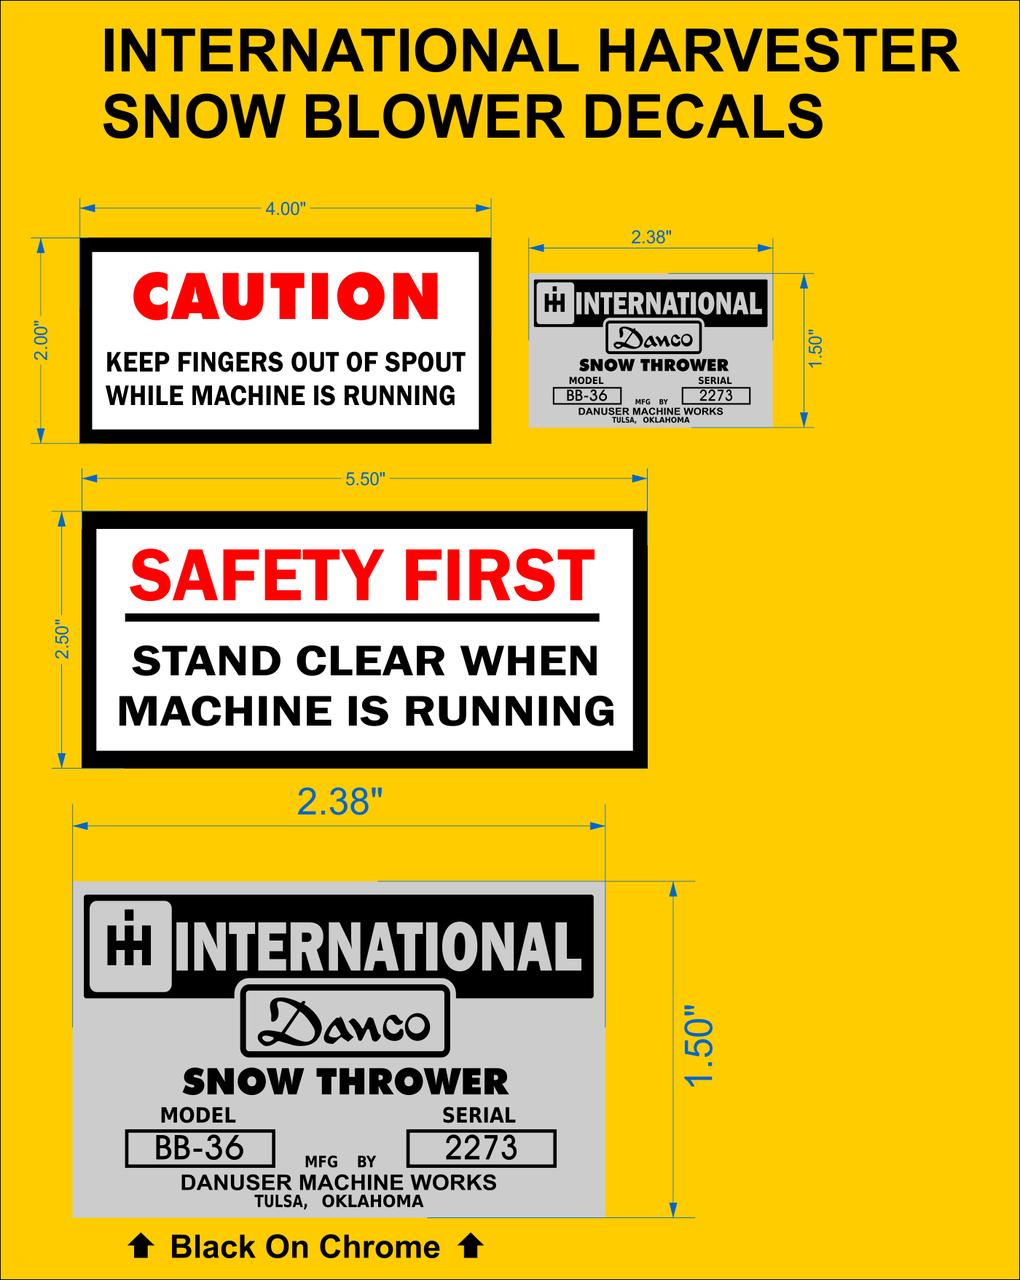 Cub Cadet International Harvester Danco Snow Blower Reproduction Decals Redo Your Horse